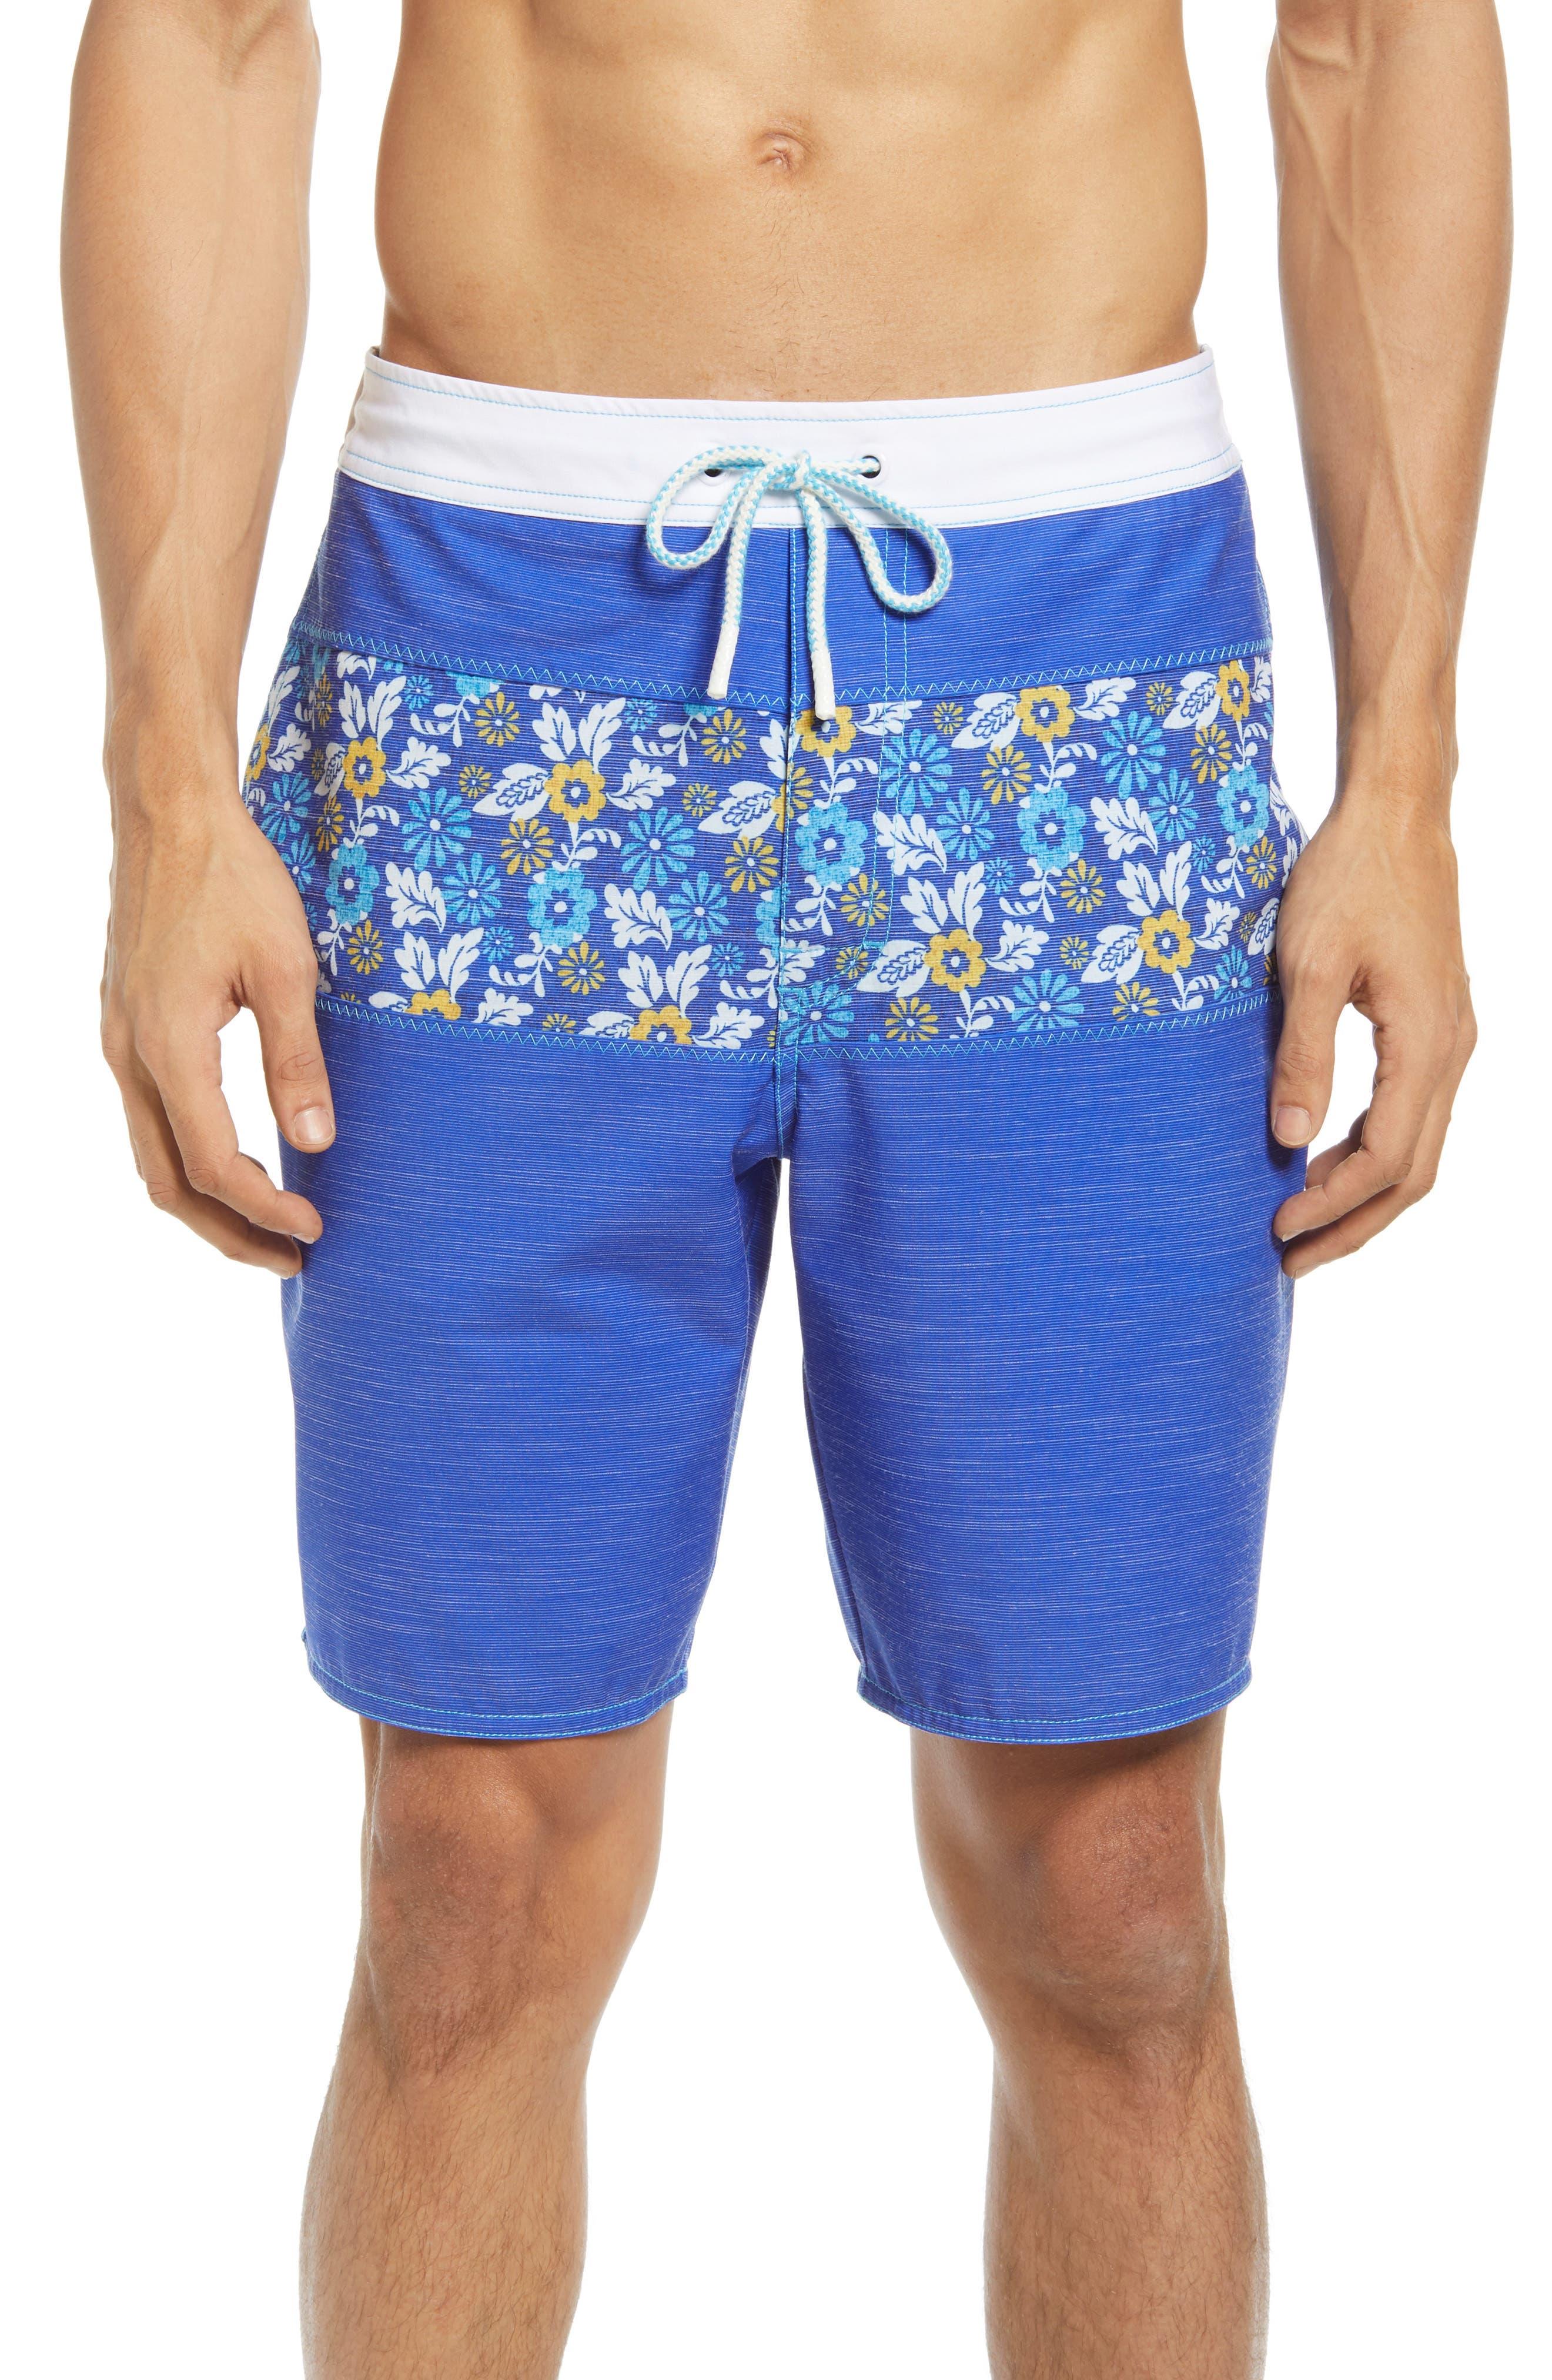 Cheynes Board Shorts